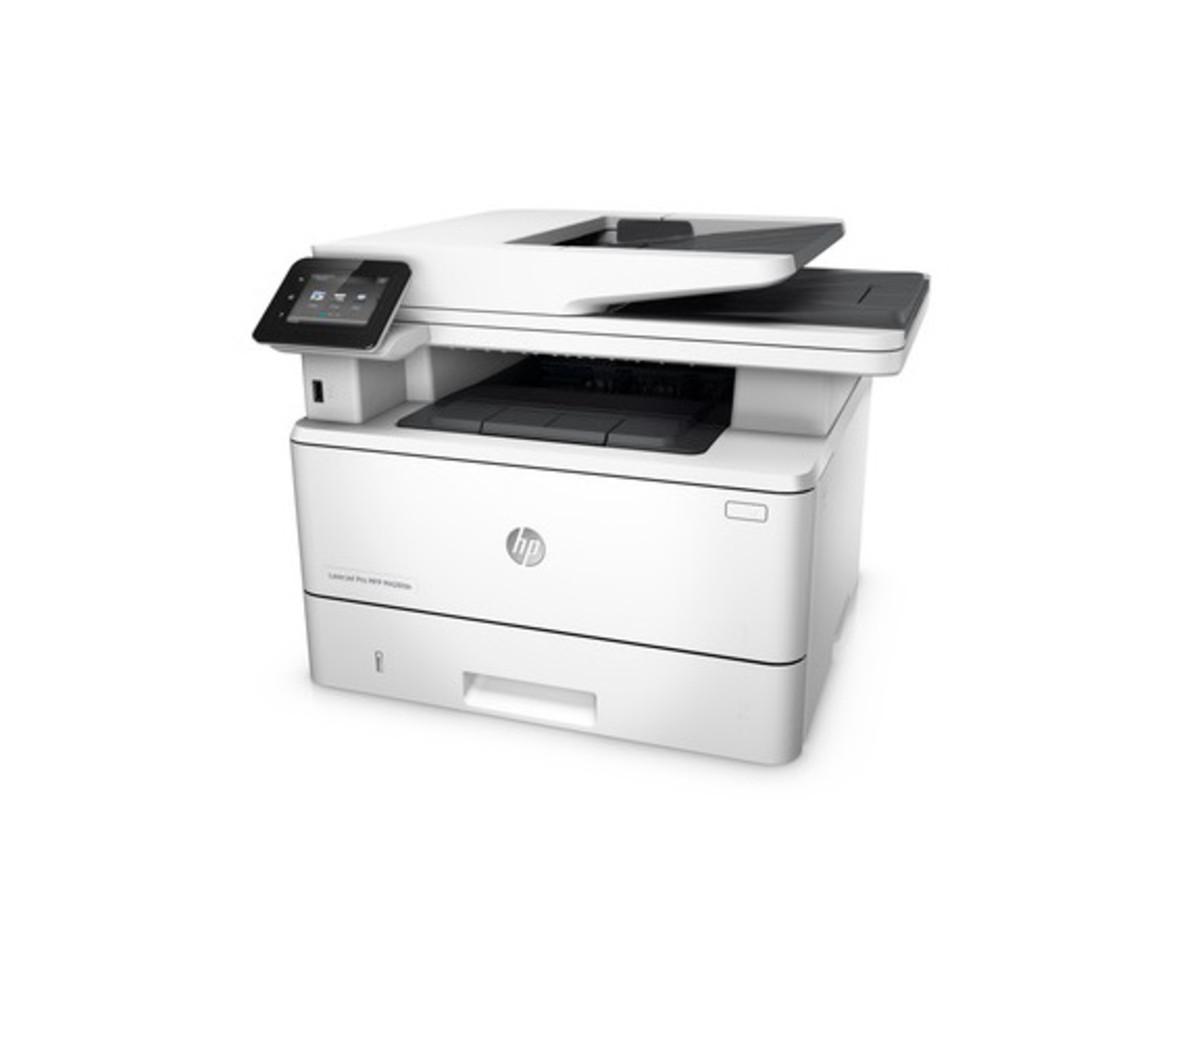 HP LaserJet Pro M426fdn Printer - Bonus Gold Class Movie Tickets